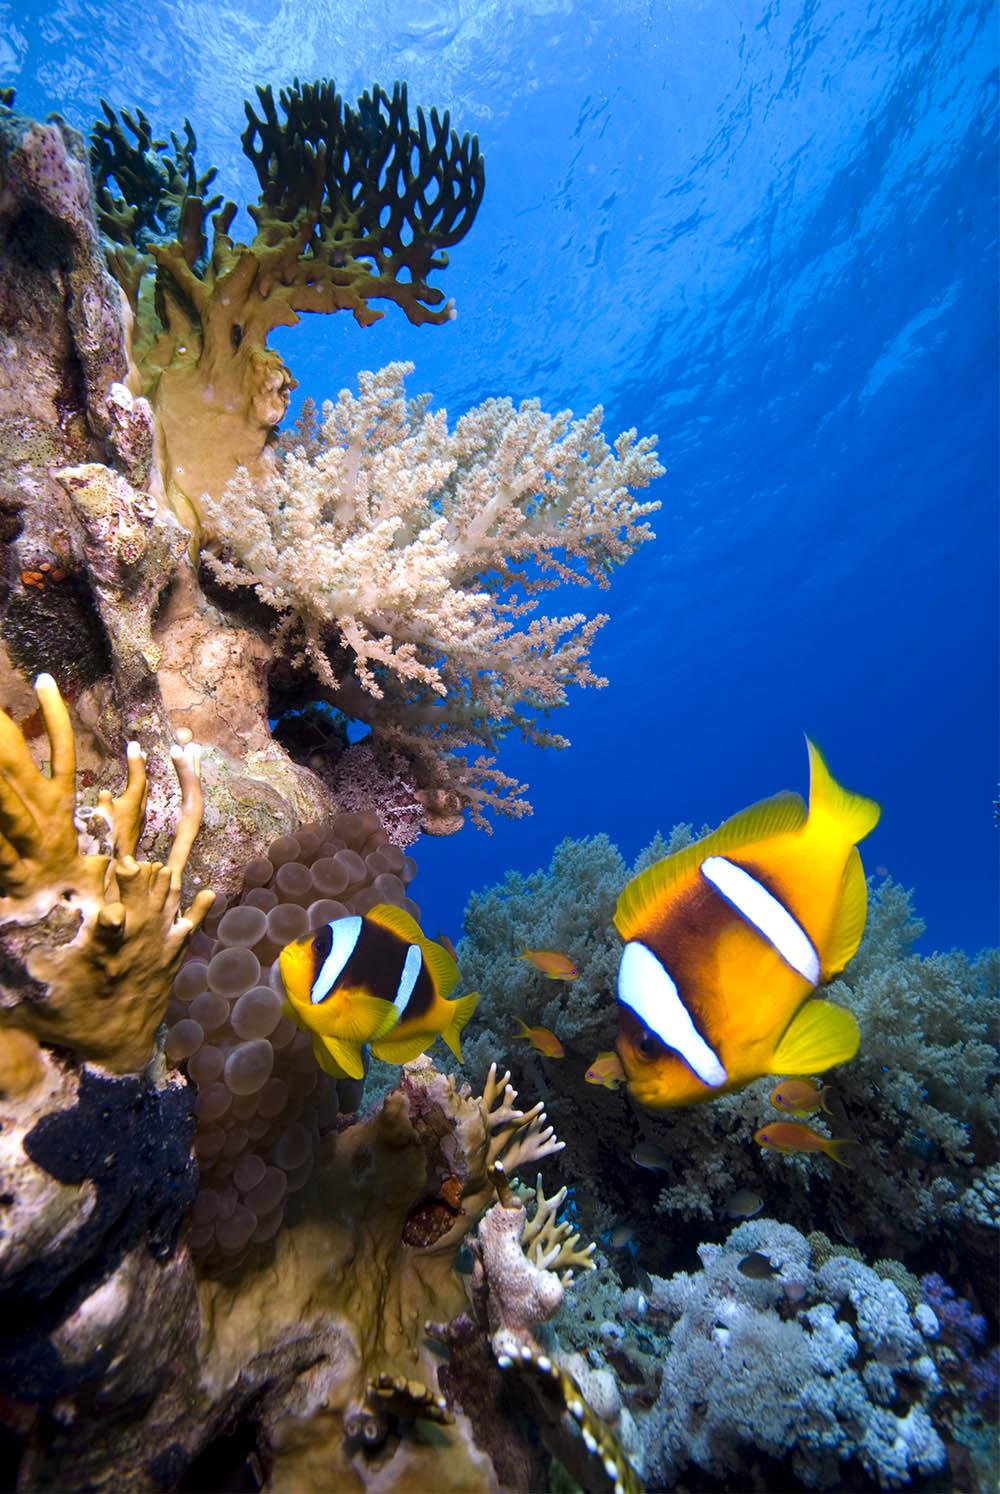 clown fish, anemone, reef